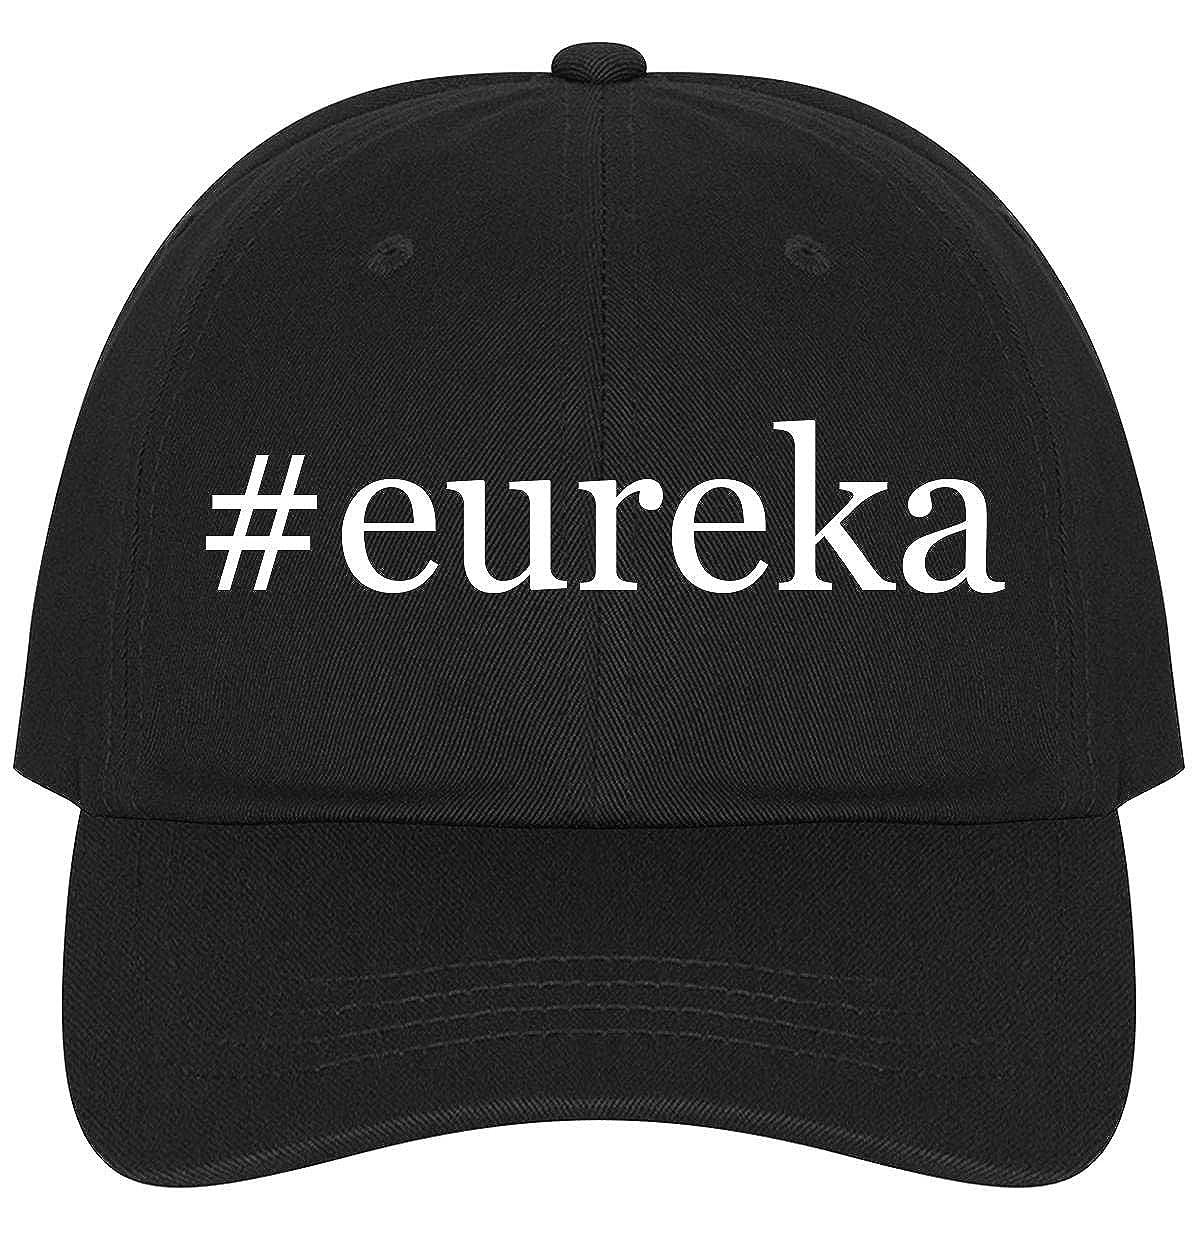 #Eureka - A Nice Comfortable Adjustable Dad Hat Cap